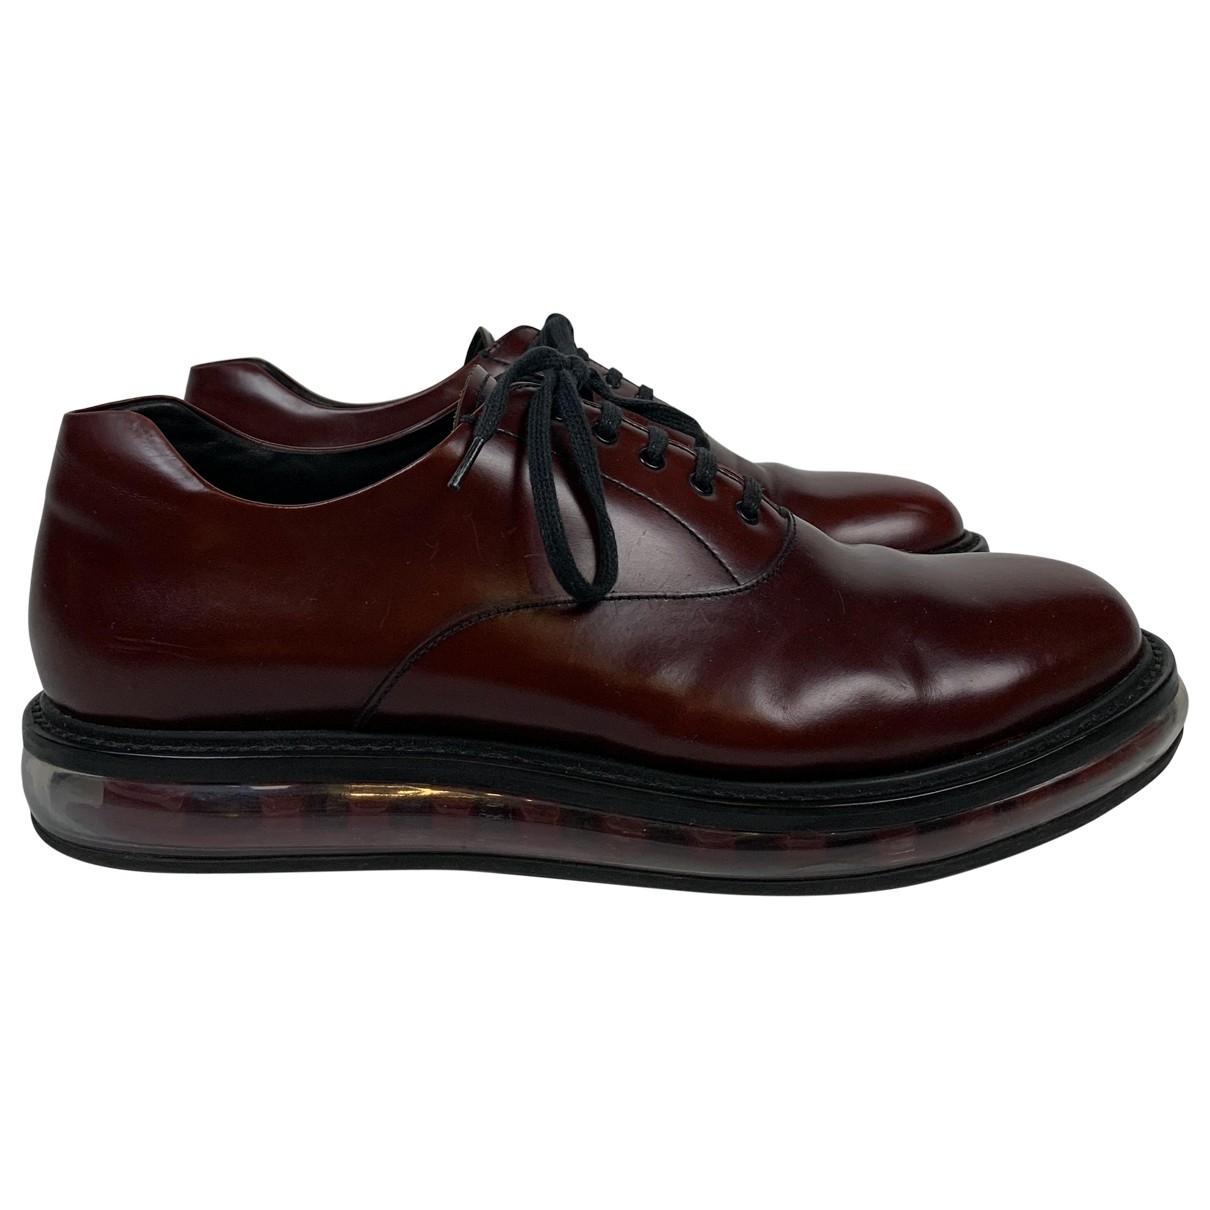 Prada \N Burgundy Leather Lace ups for Men 9 UK